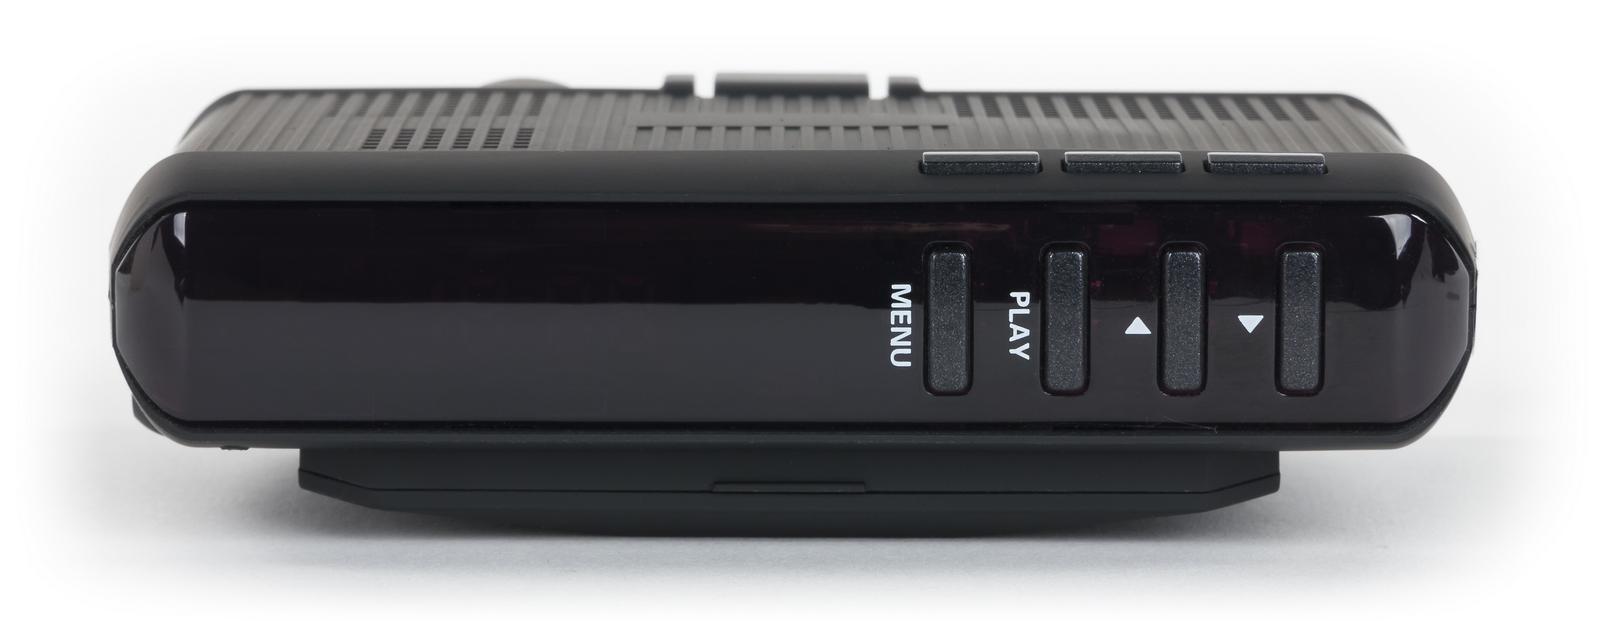 Радар детектор с gps и видеорегистратором